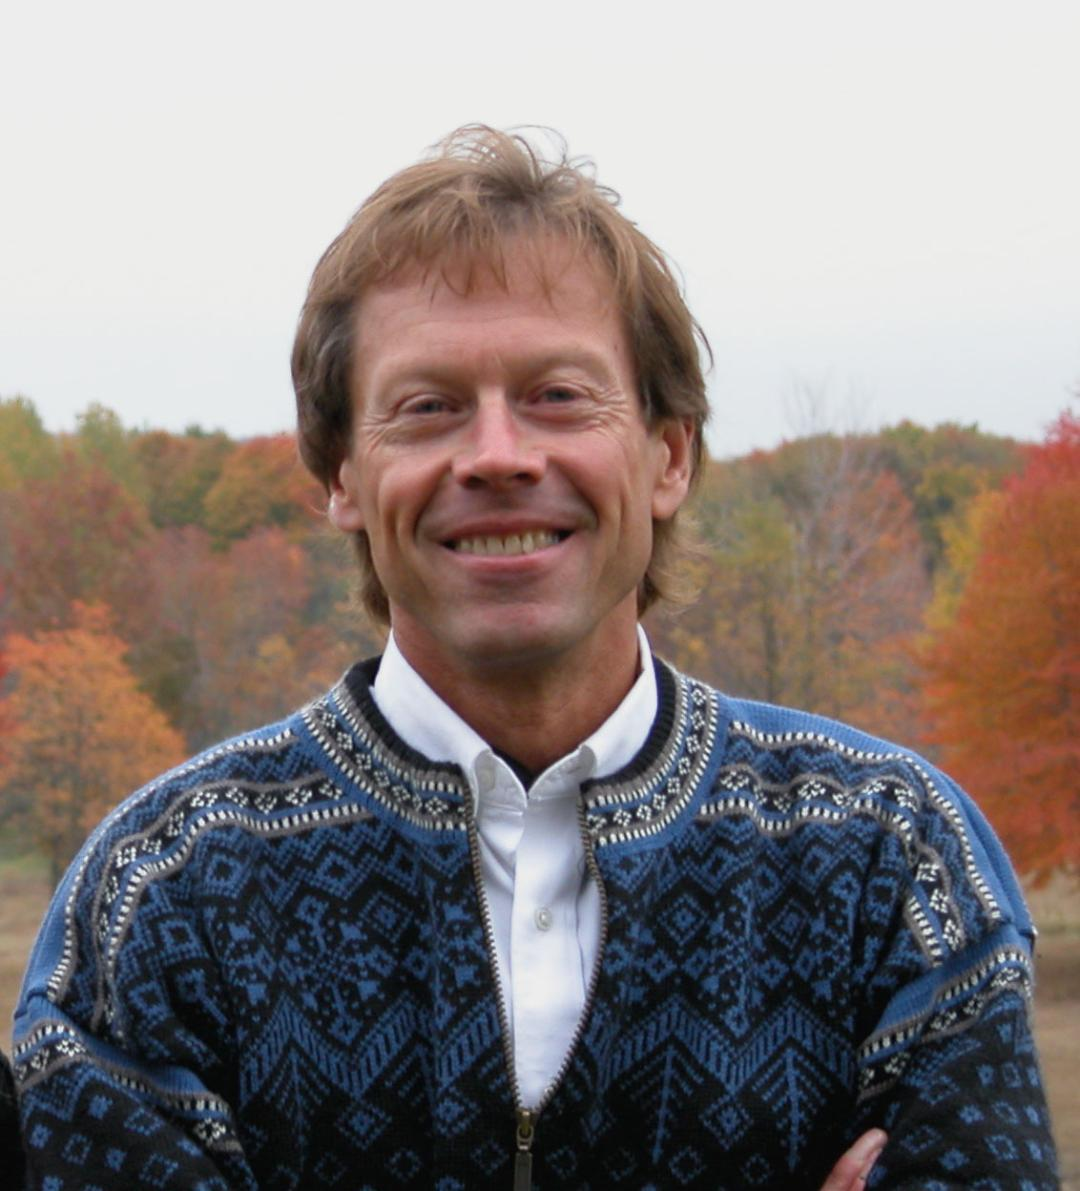 BWW Interview: PART TWO - SUPERNATURAL HISTORIAN & AUTHOR MASON WINFIELD